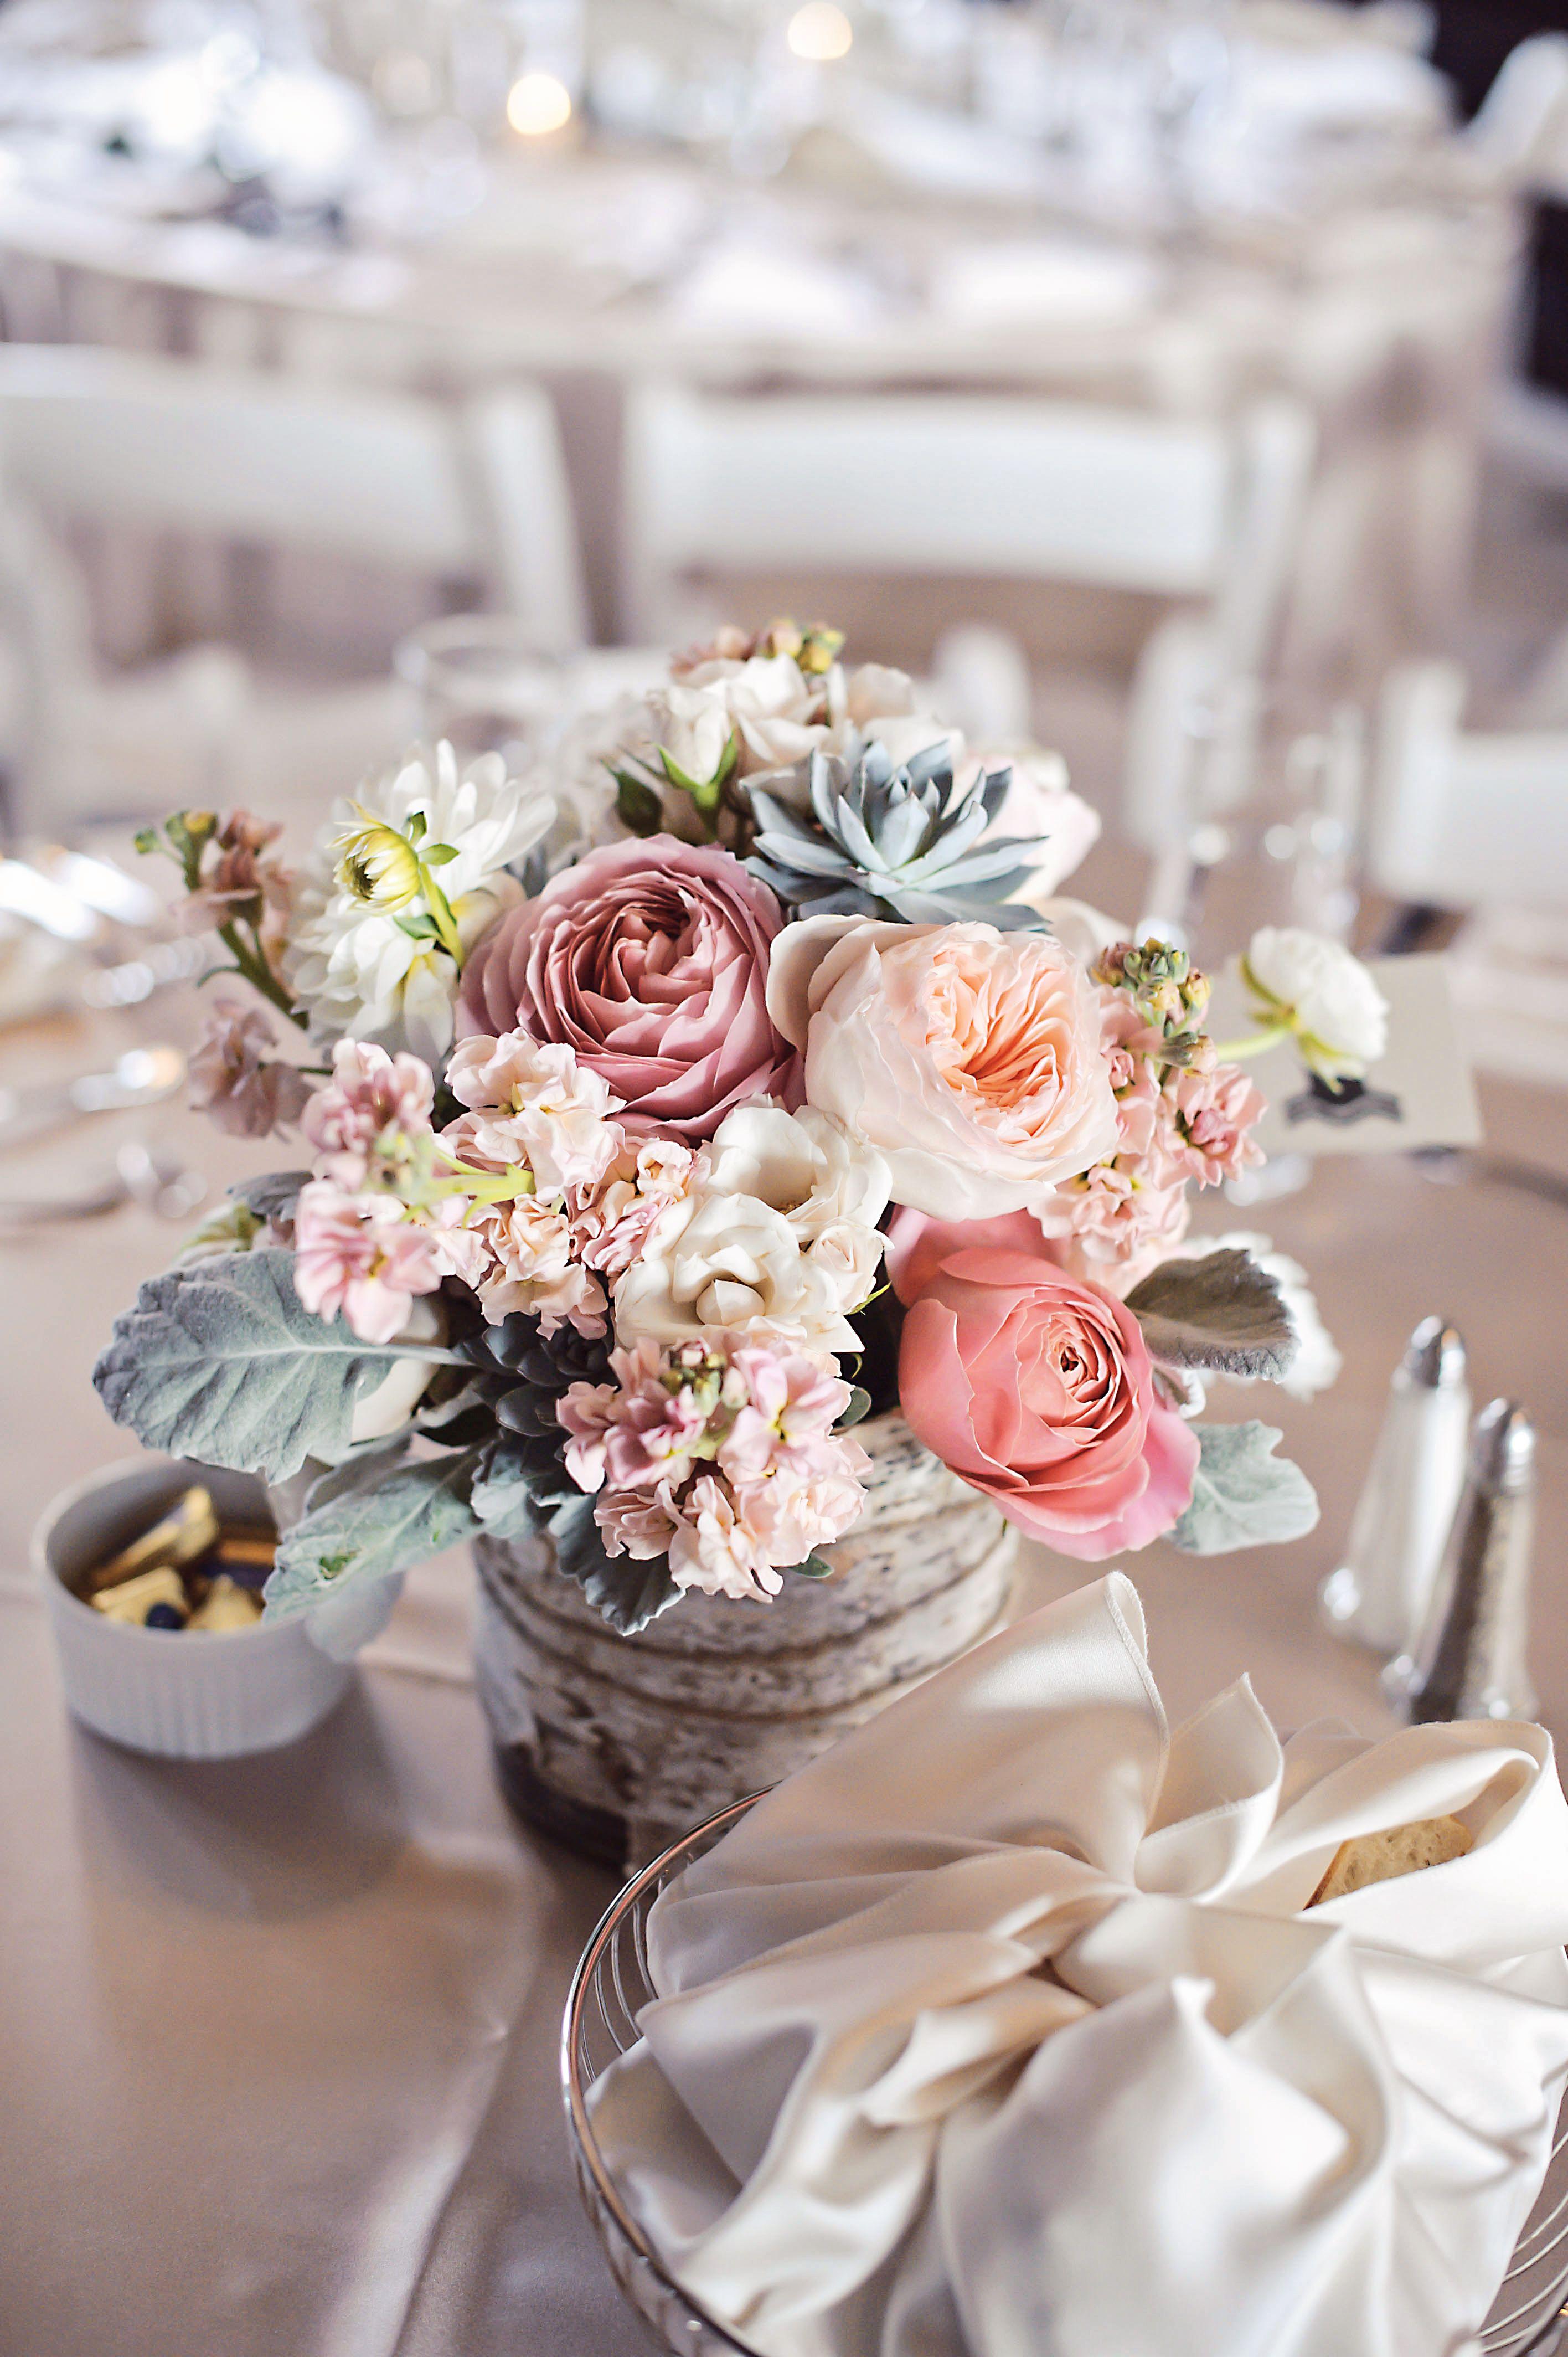 Azalea Floral Design Centerpiece Blush Pink Garden Roses Peach